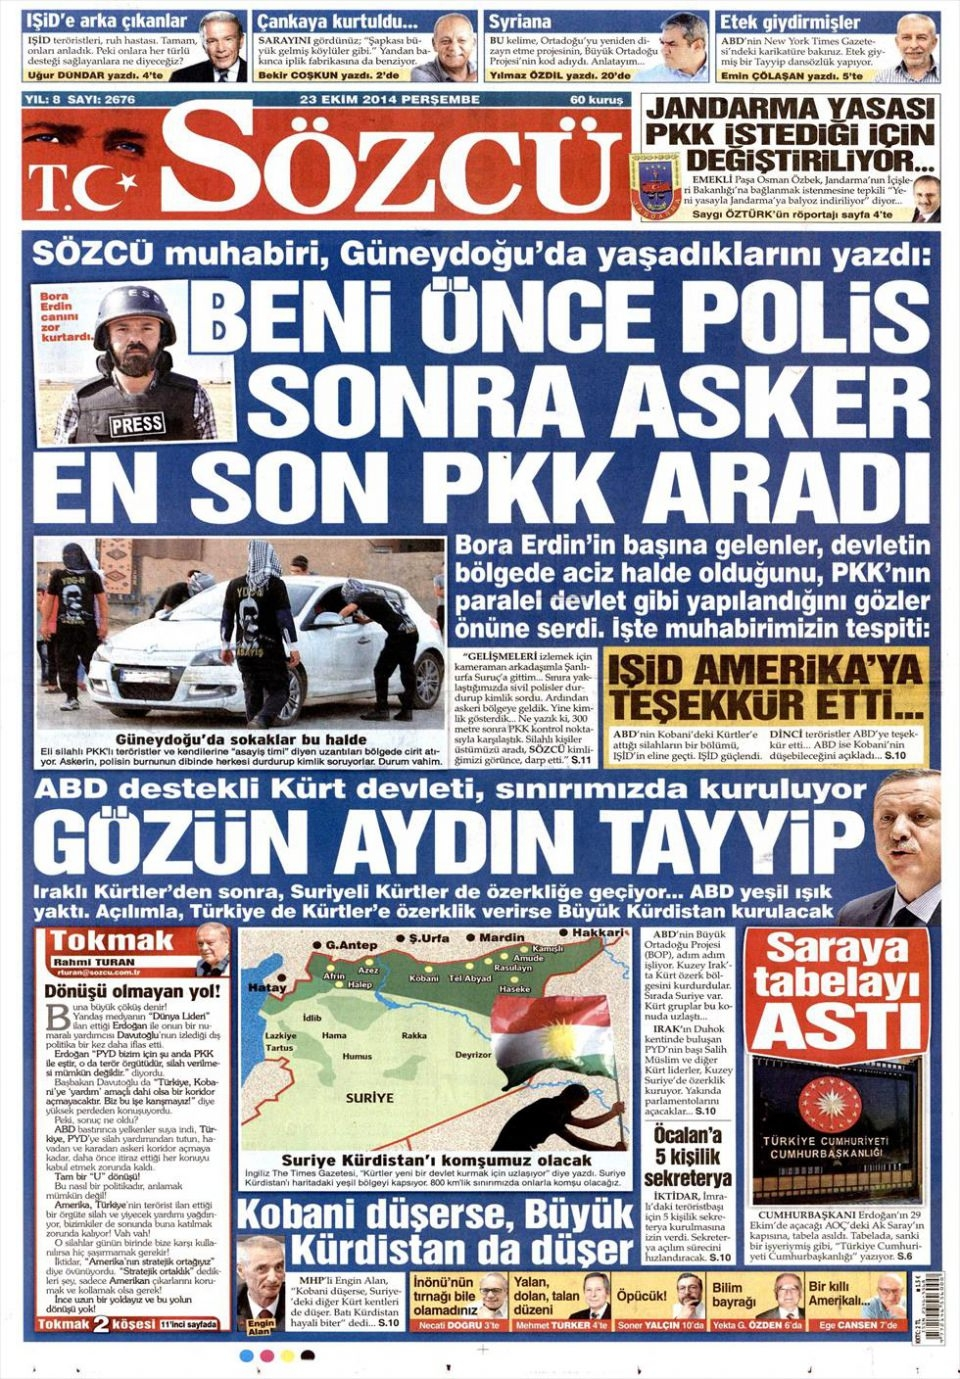 23 Ekim 2014 gazete manşetleri 15